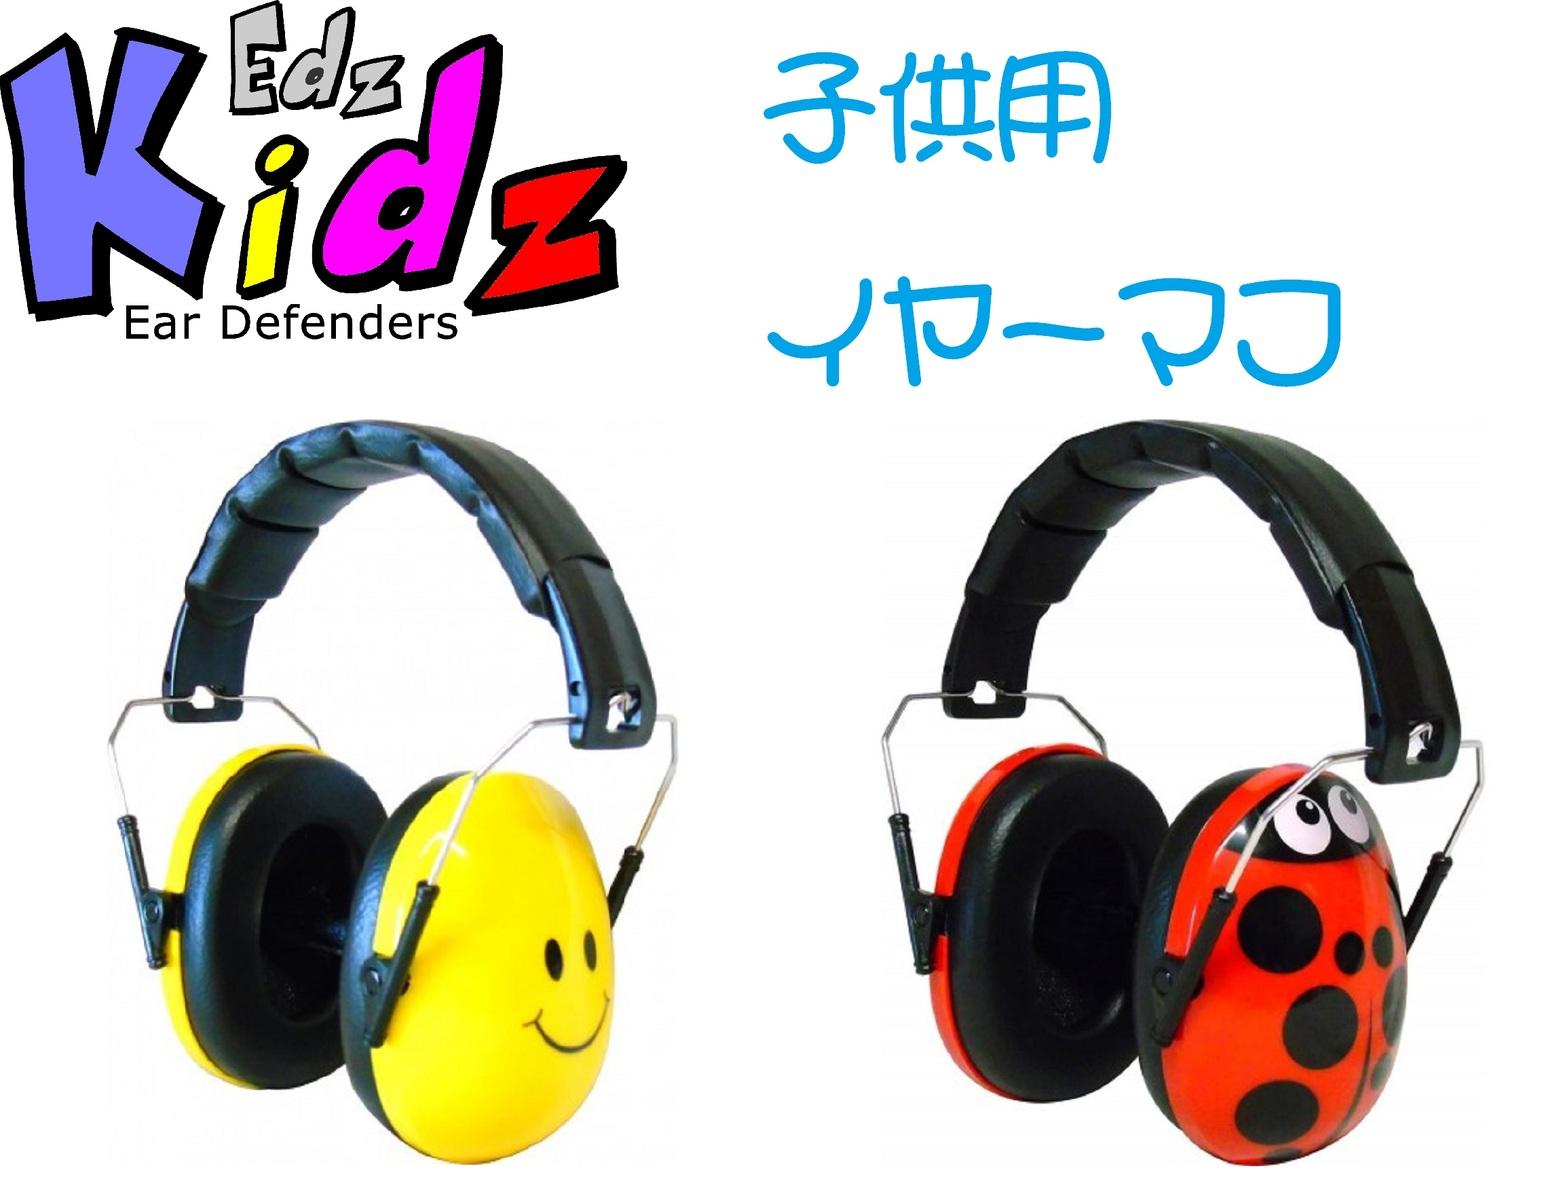 Edz Kidz 子供用 日本 防音イヤーマフ 自閉症 聴覚過敏 対策 送料無料 イギリス ブランド 卸売り 調節機能 着せ替えキャップ 子供 イヤーマフ 防音 キッズ バッグ付き ベビー スマイル てんとう虫